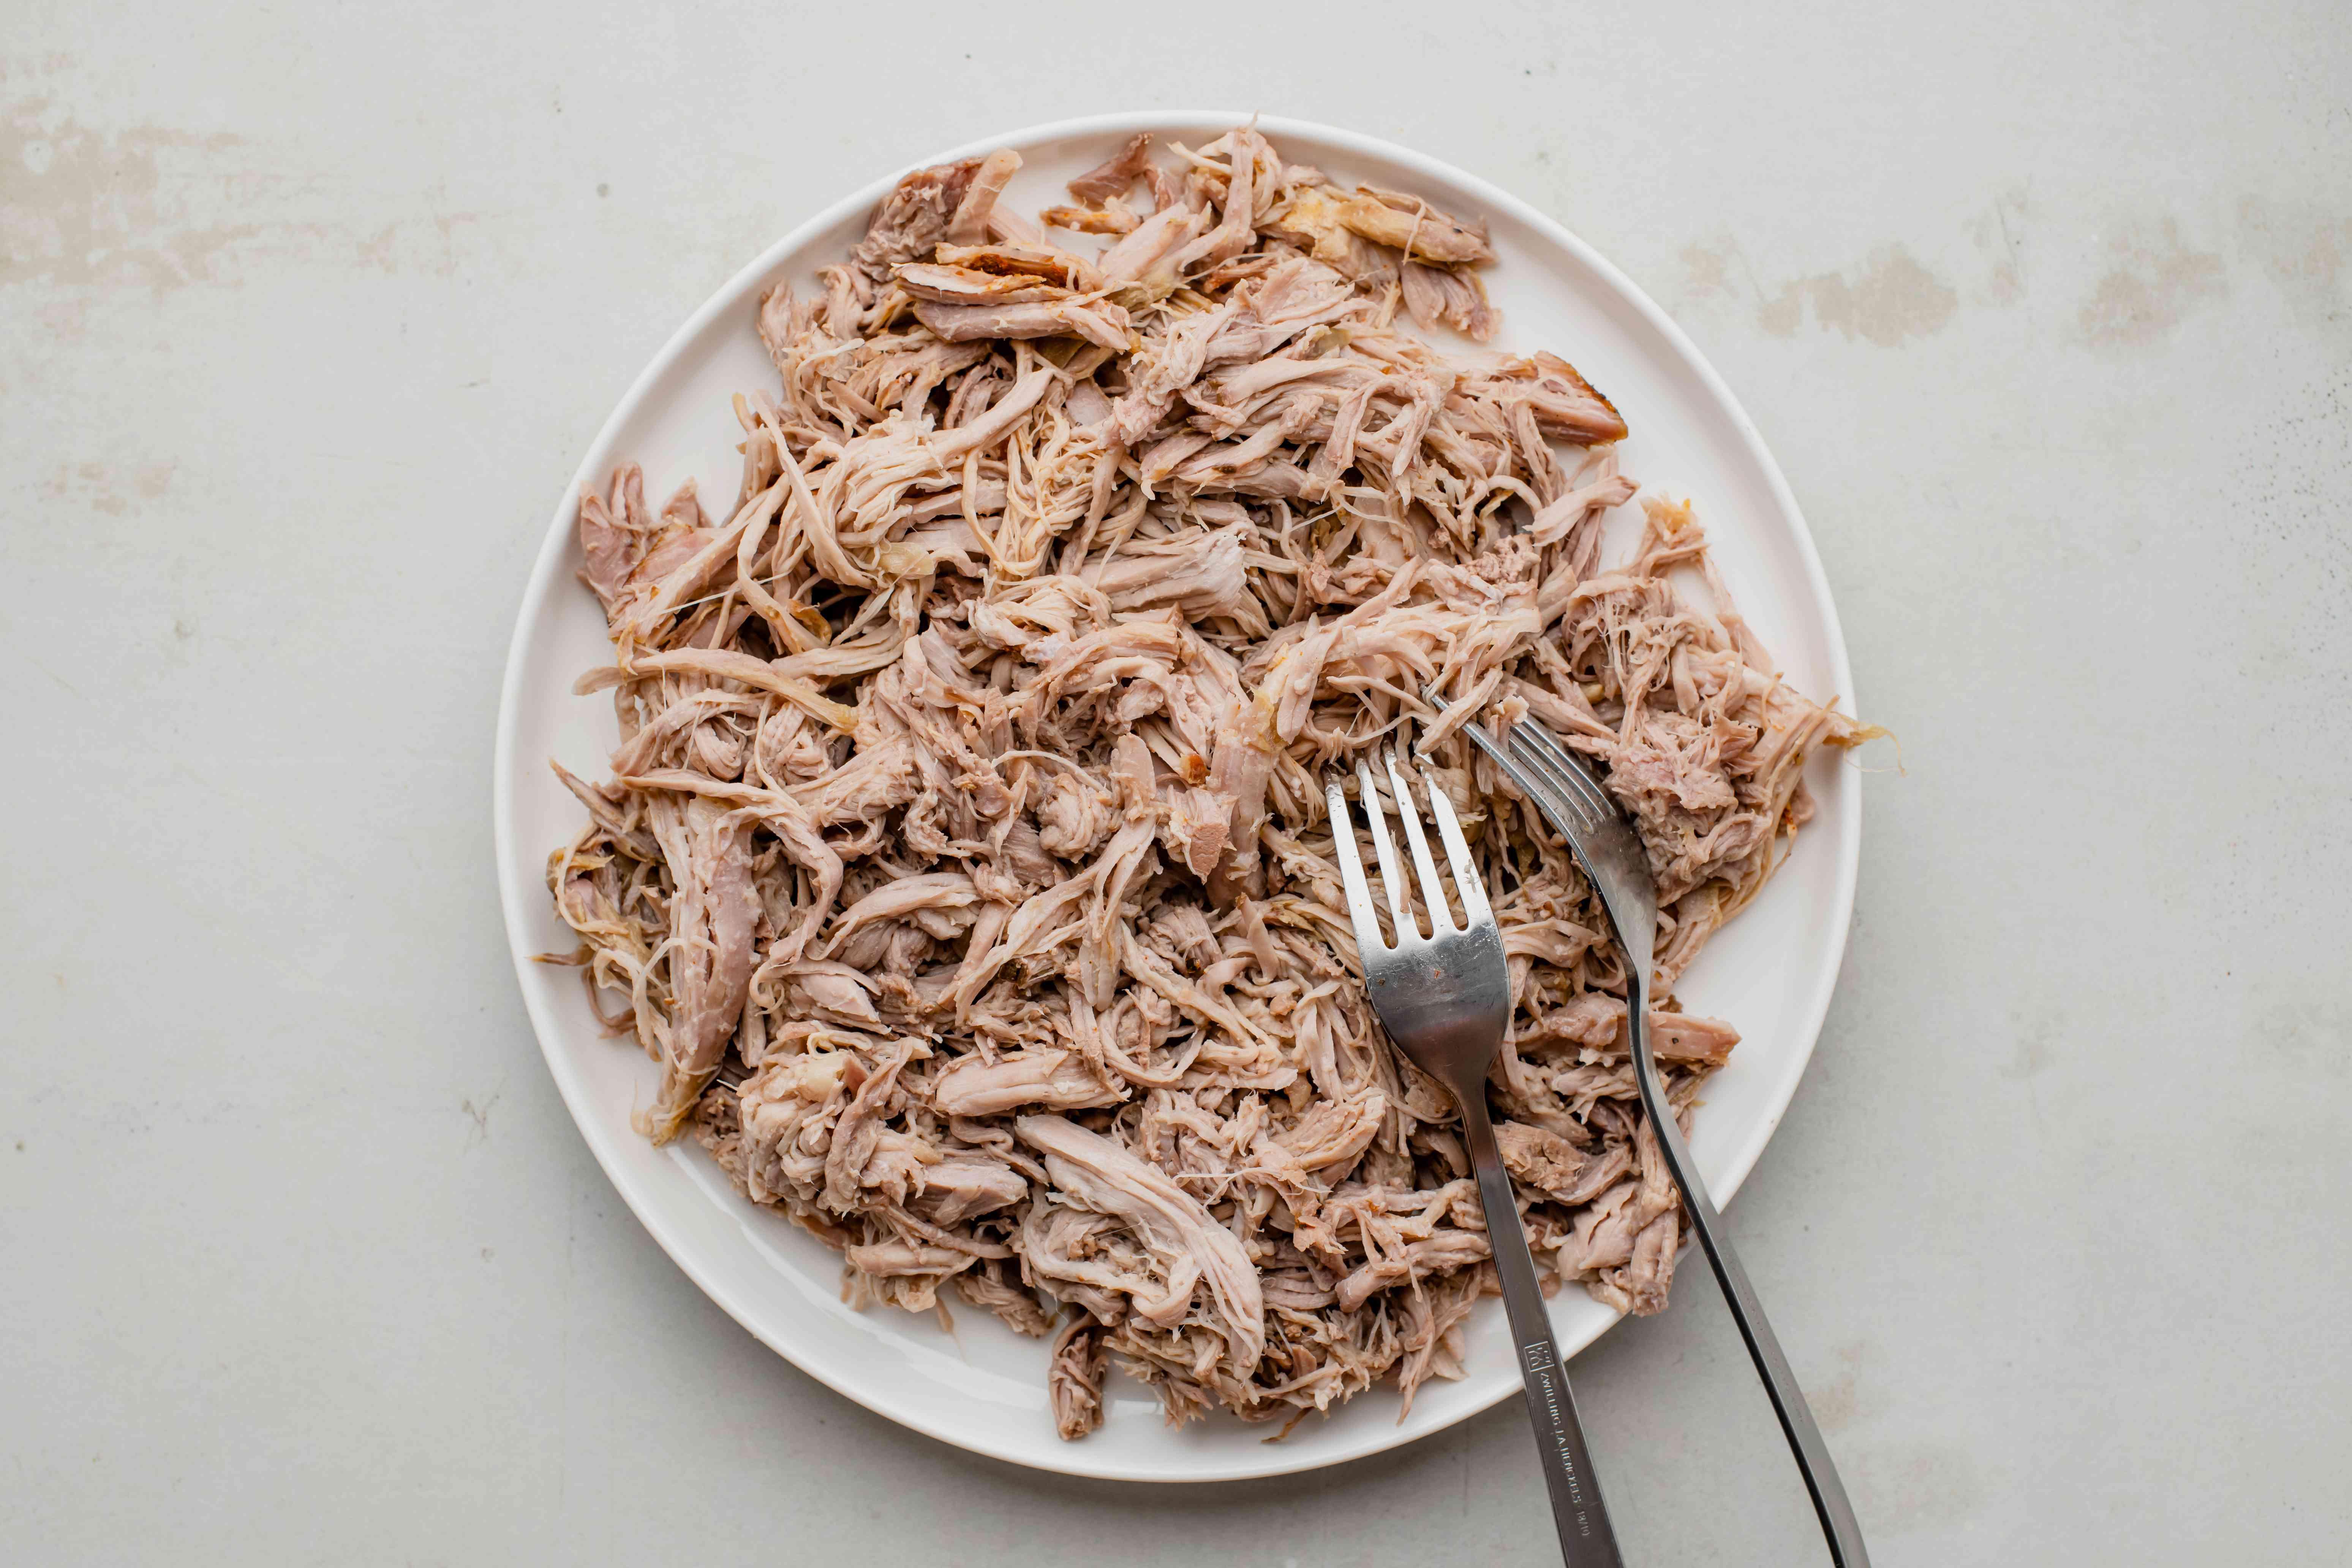 Shredded pork on a plate